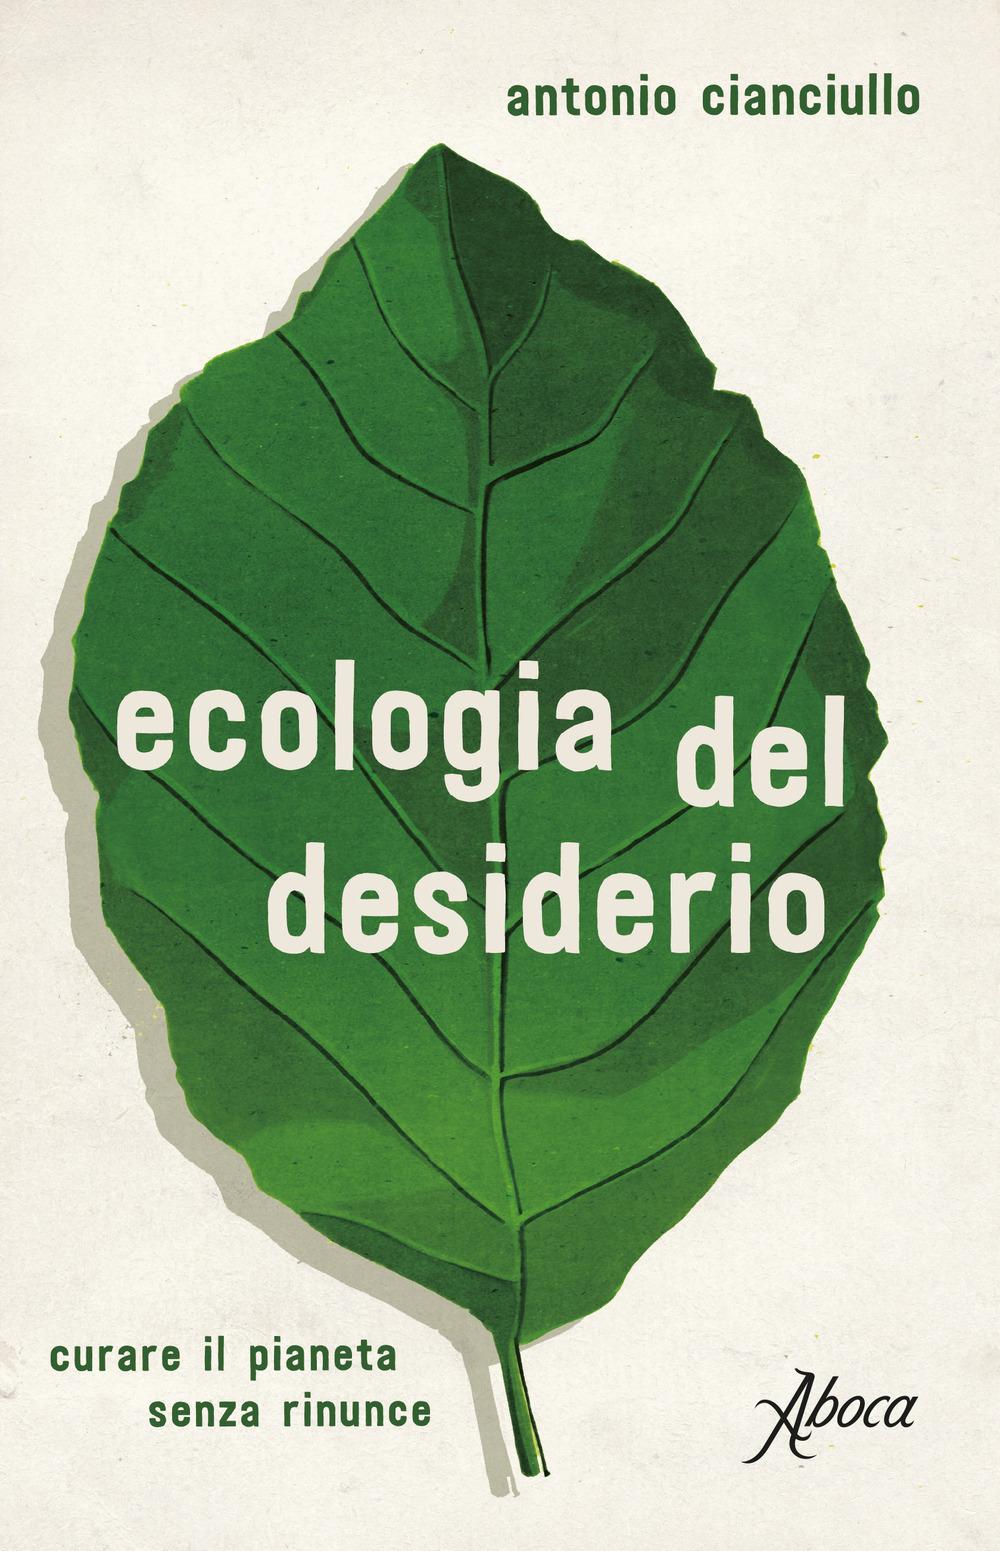 Antonio Cianciullo: Ecologia del desiderio